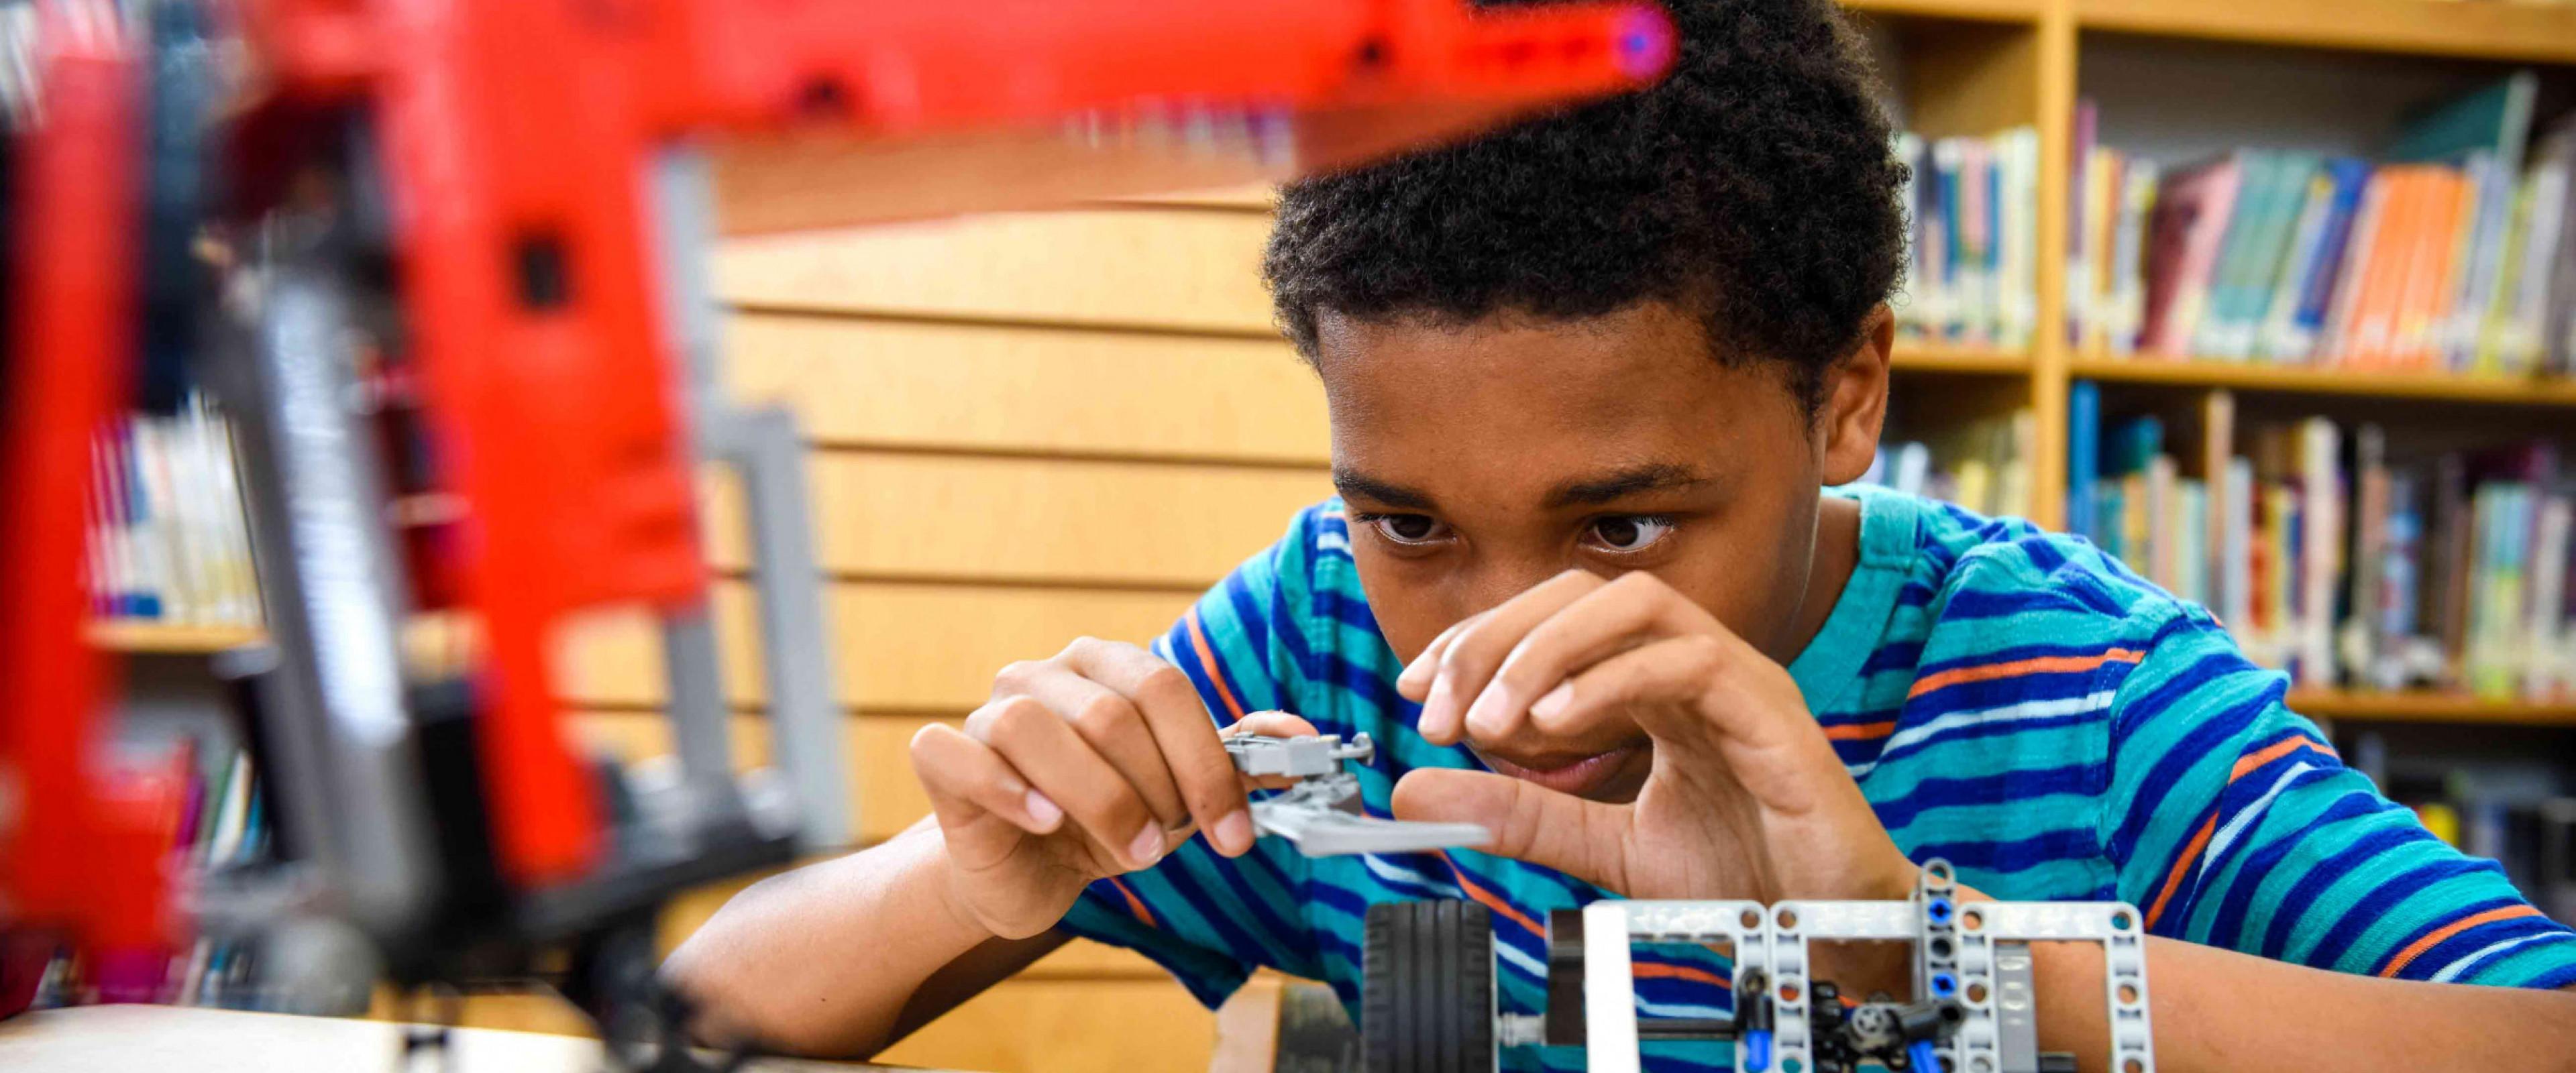 Child working with robotics